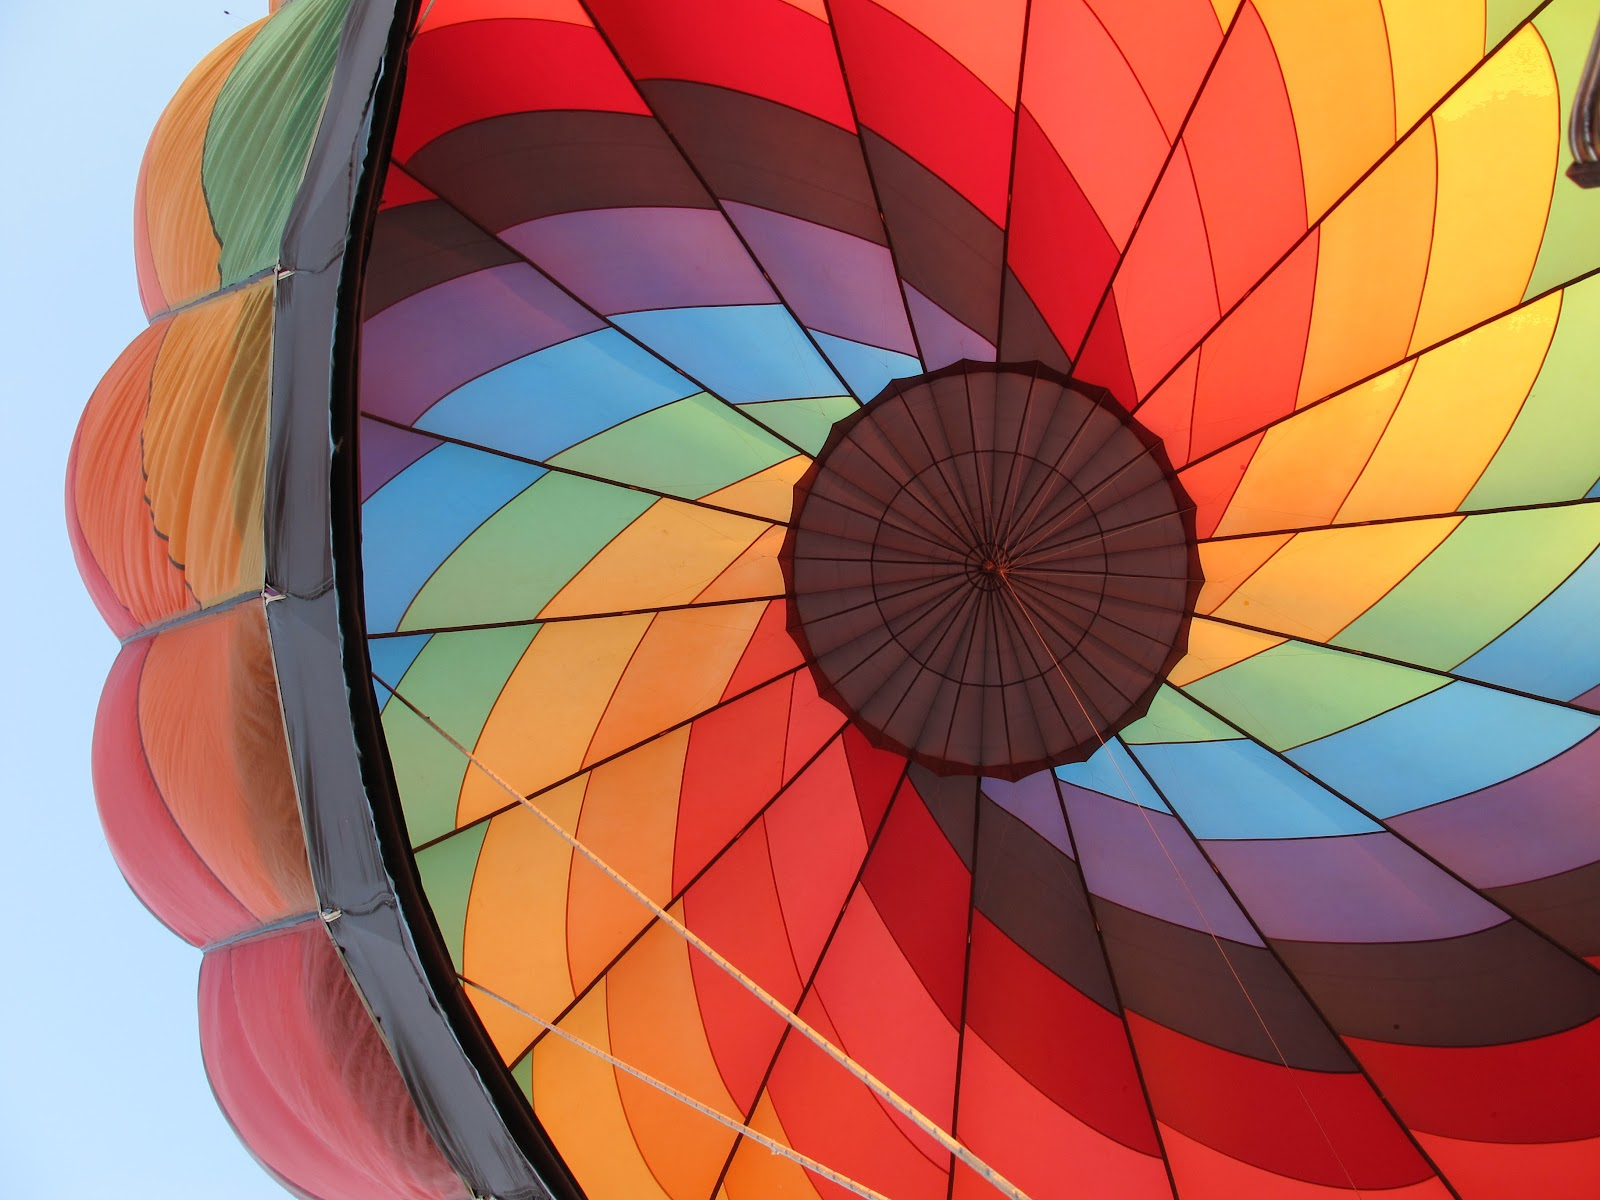 balon-couleurs